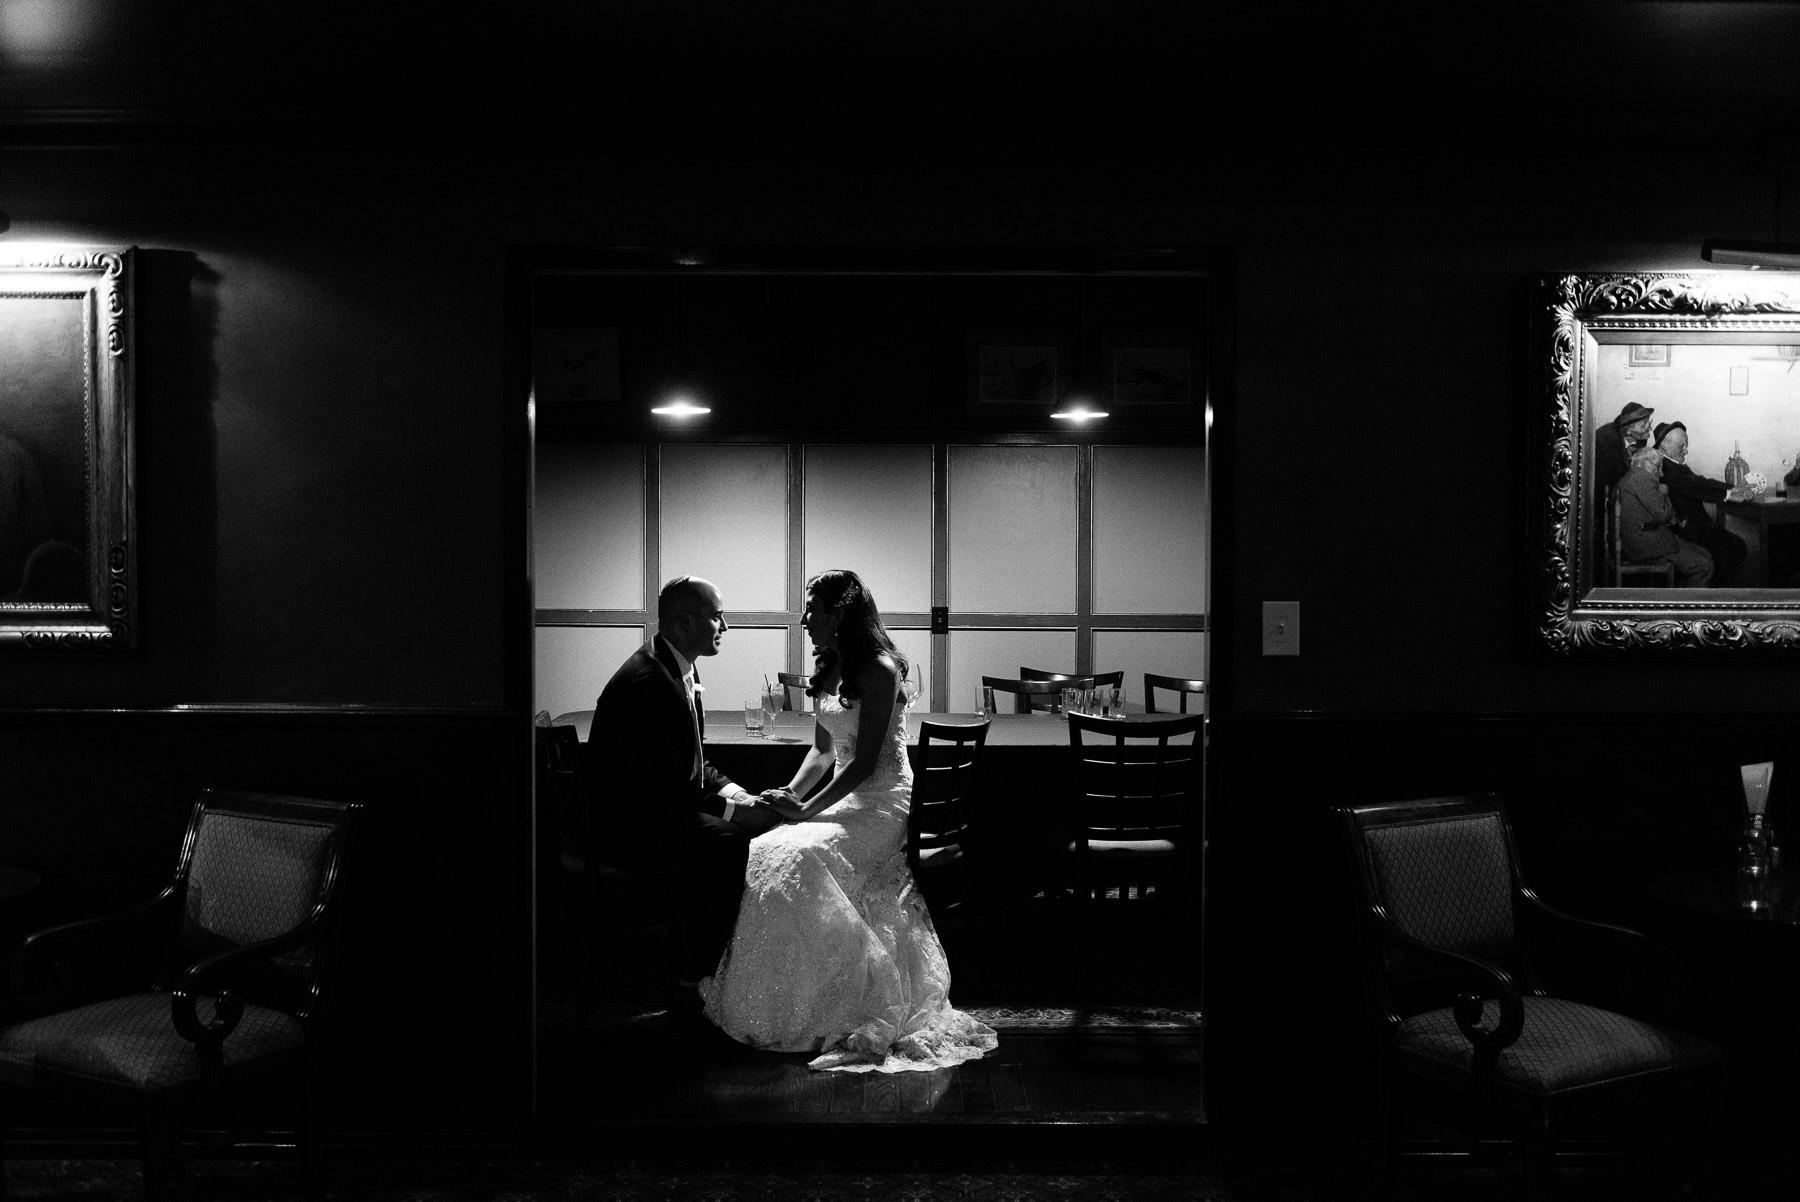 racquet-club-philadelphia-wedding-45.jpg